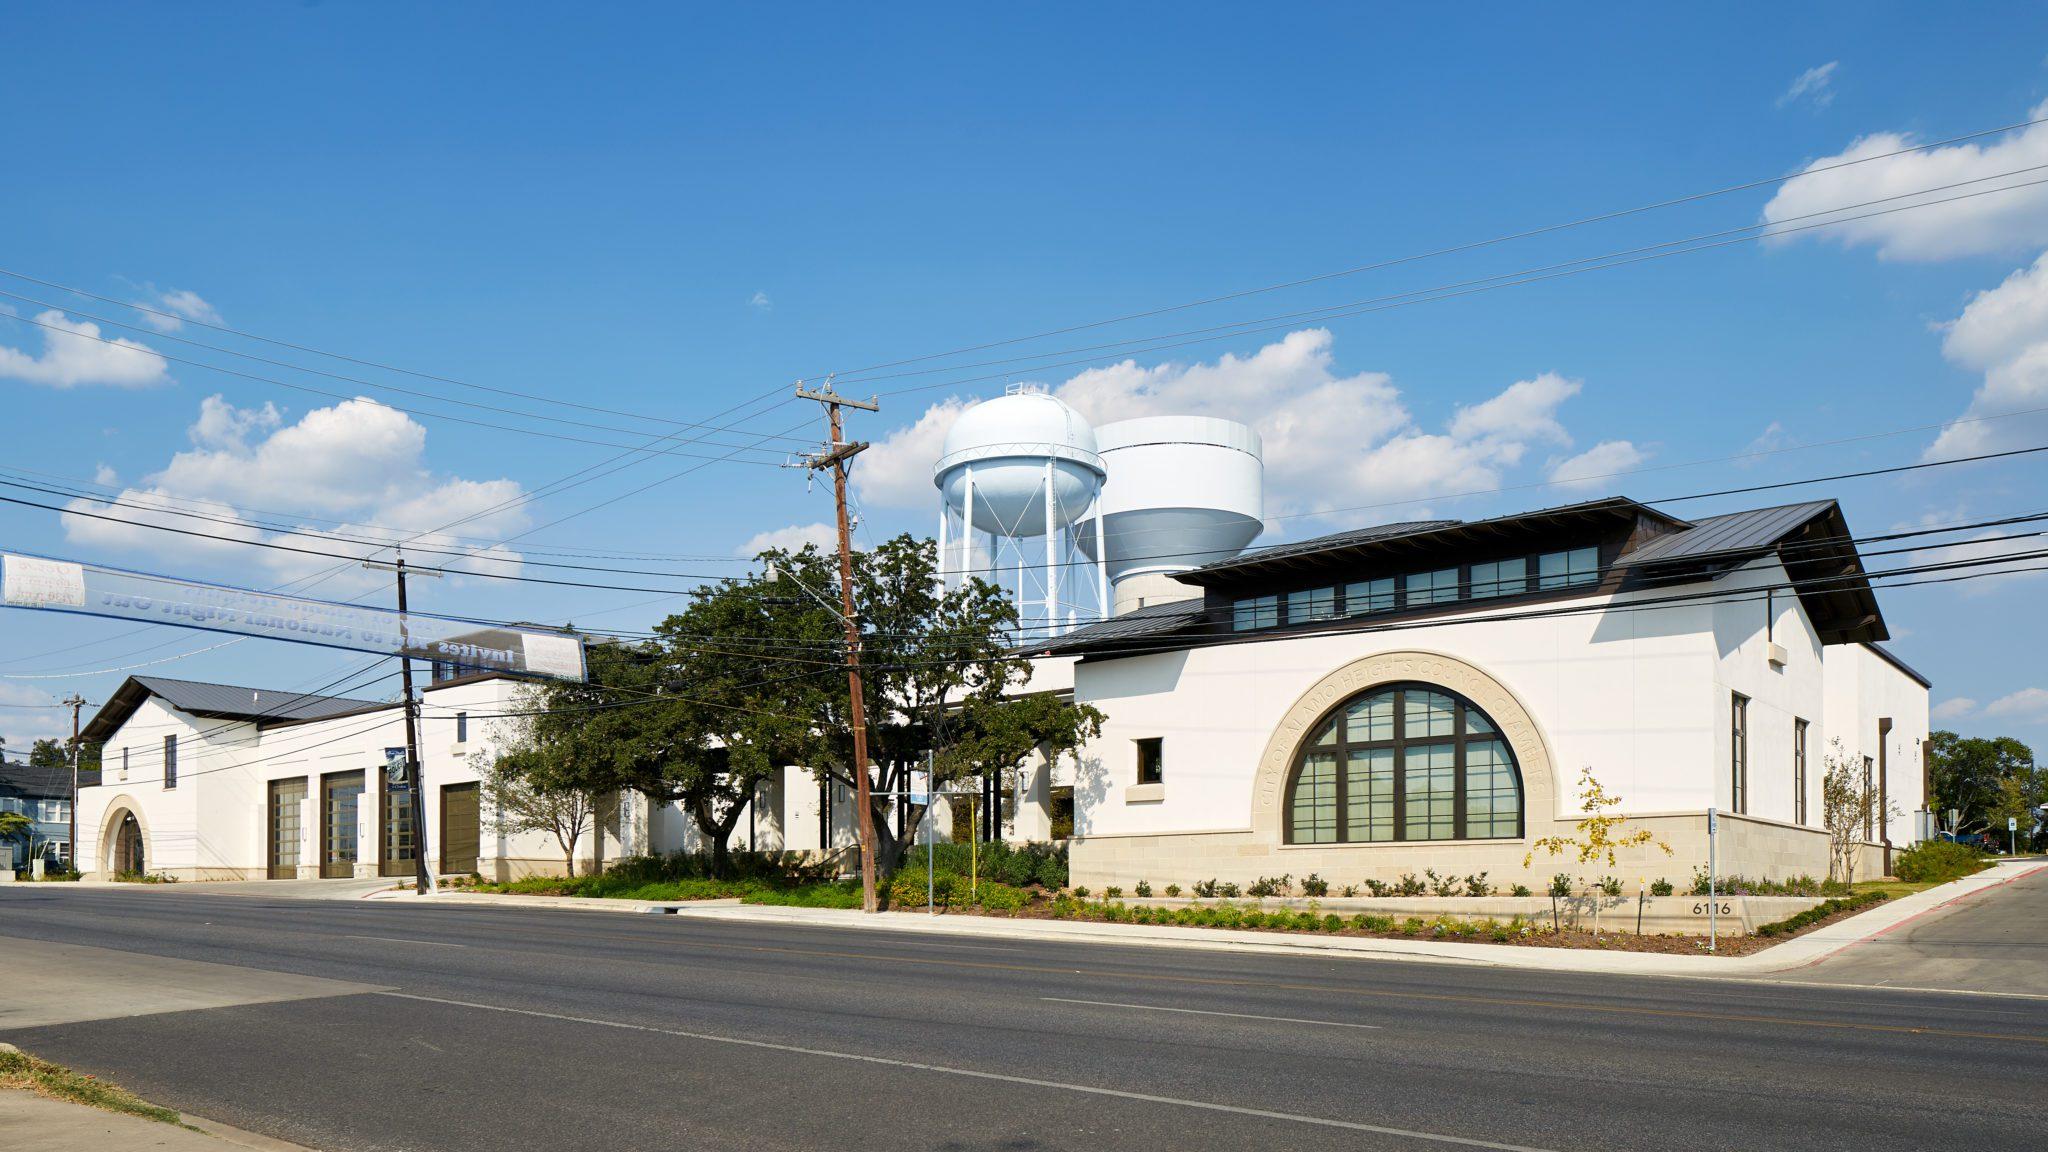 Alamo Heights Municipal Complex